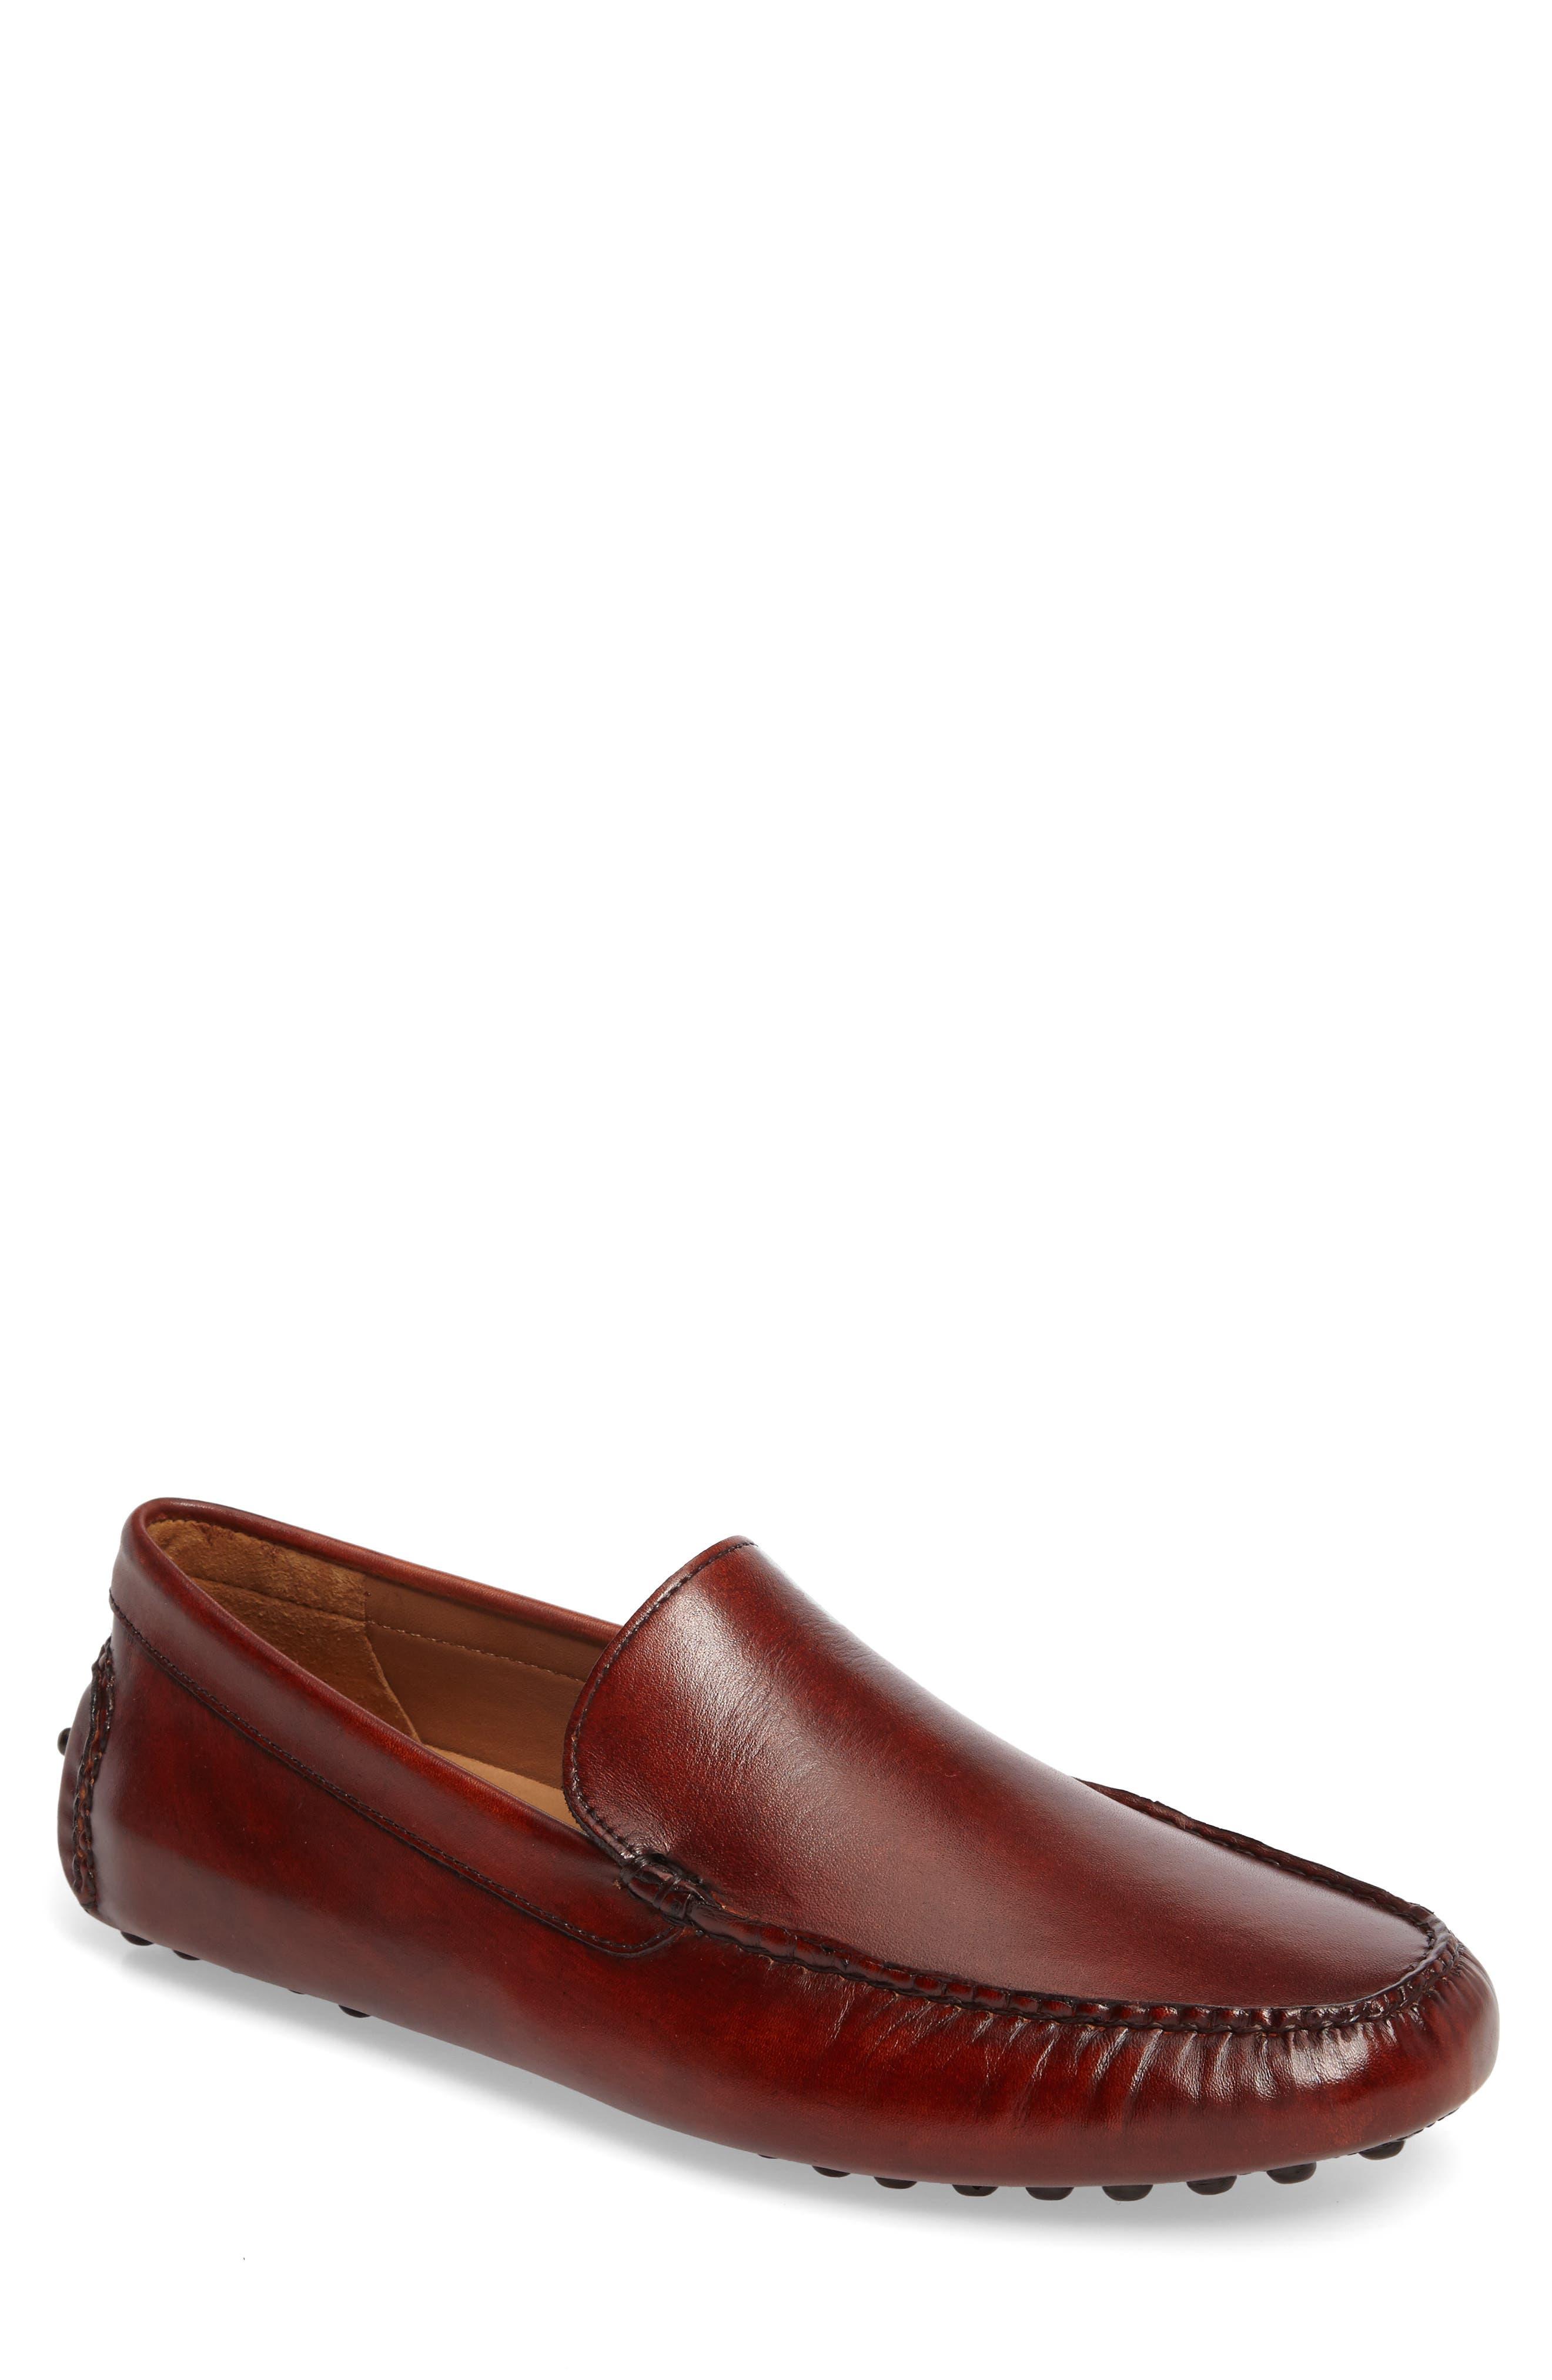 Alternate Image 1 Selected - John W. Nordstrom® Cane Driving Shoe (Men)